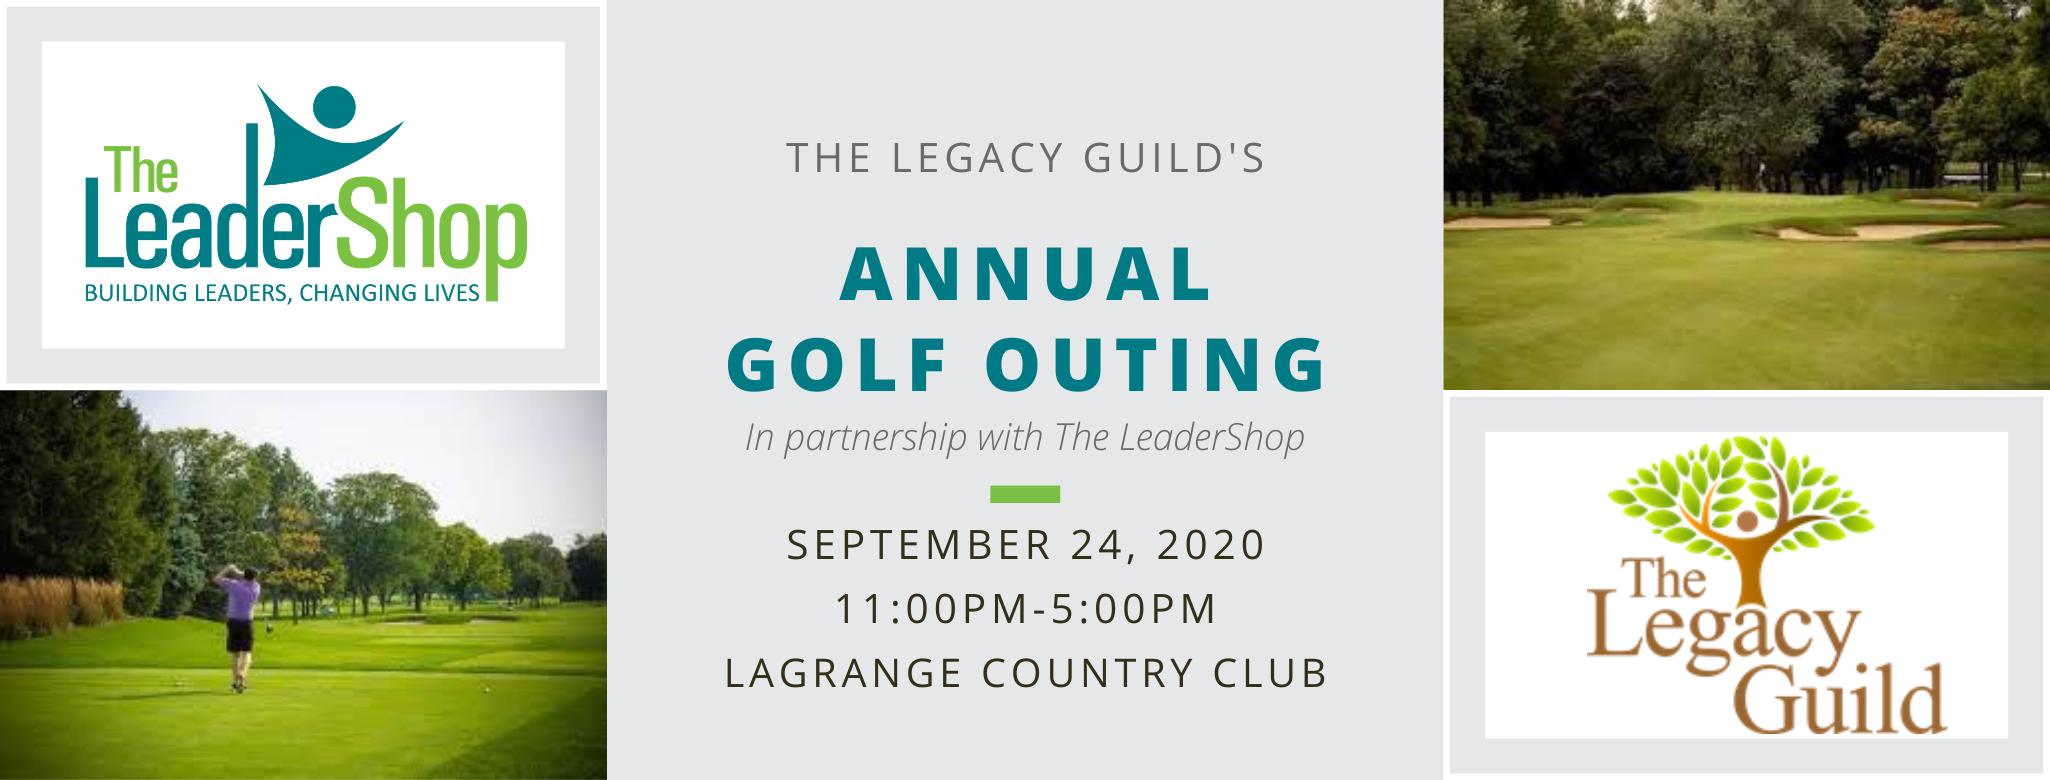 golf banner 2020 by leadershop.png